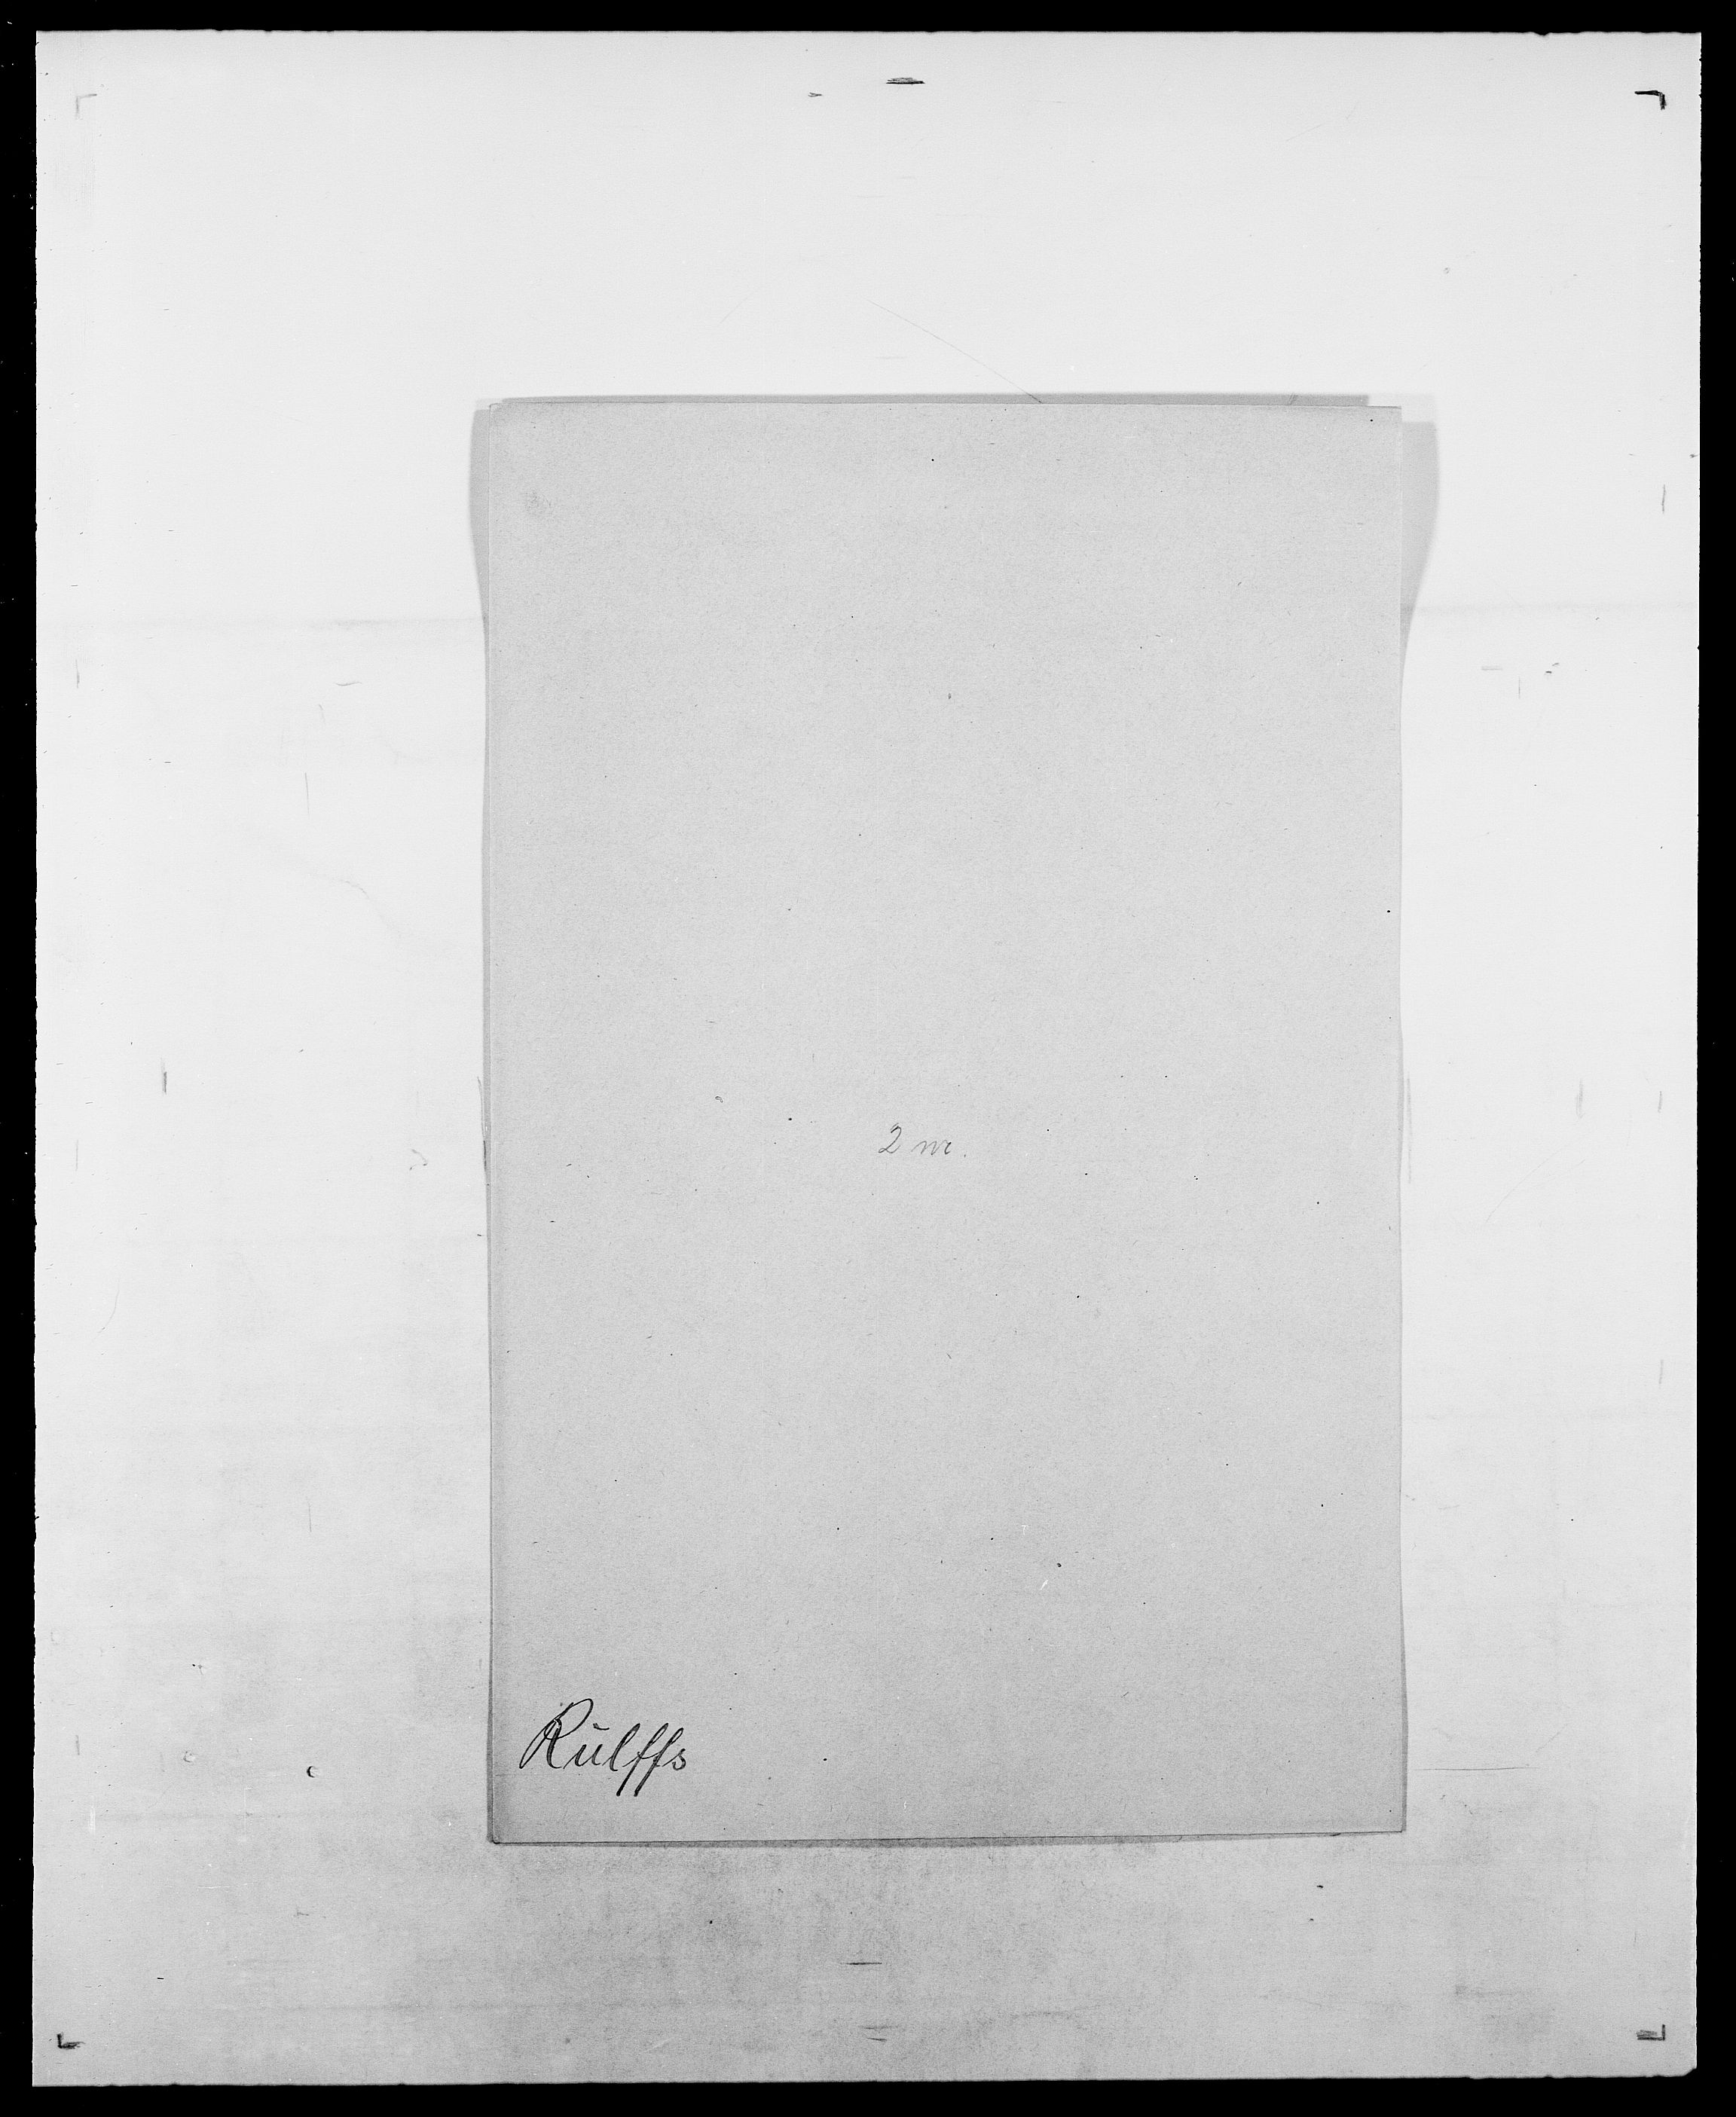 SAO, Delgobe, Charles Antoine - samling, D/Da/L0033: Roald - Røyem, s. 451